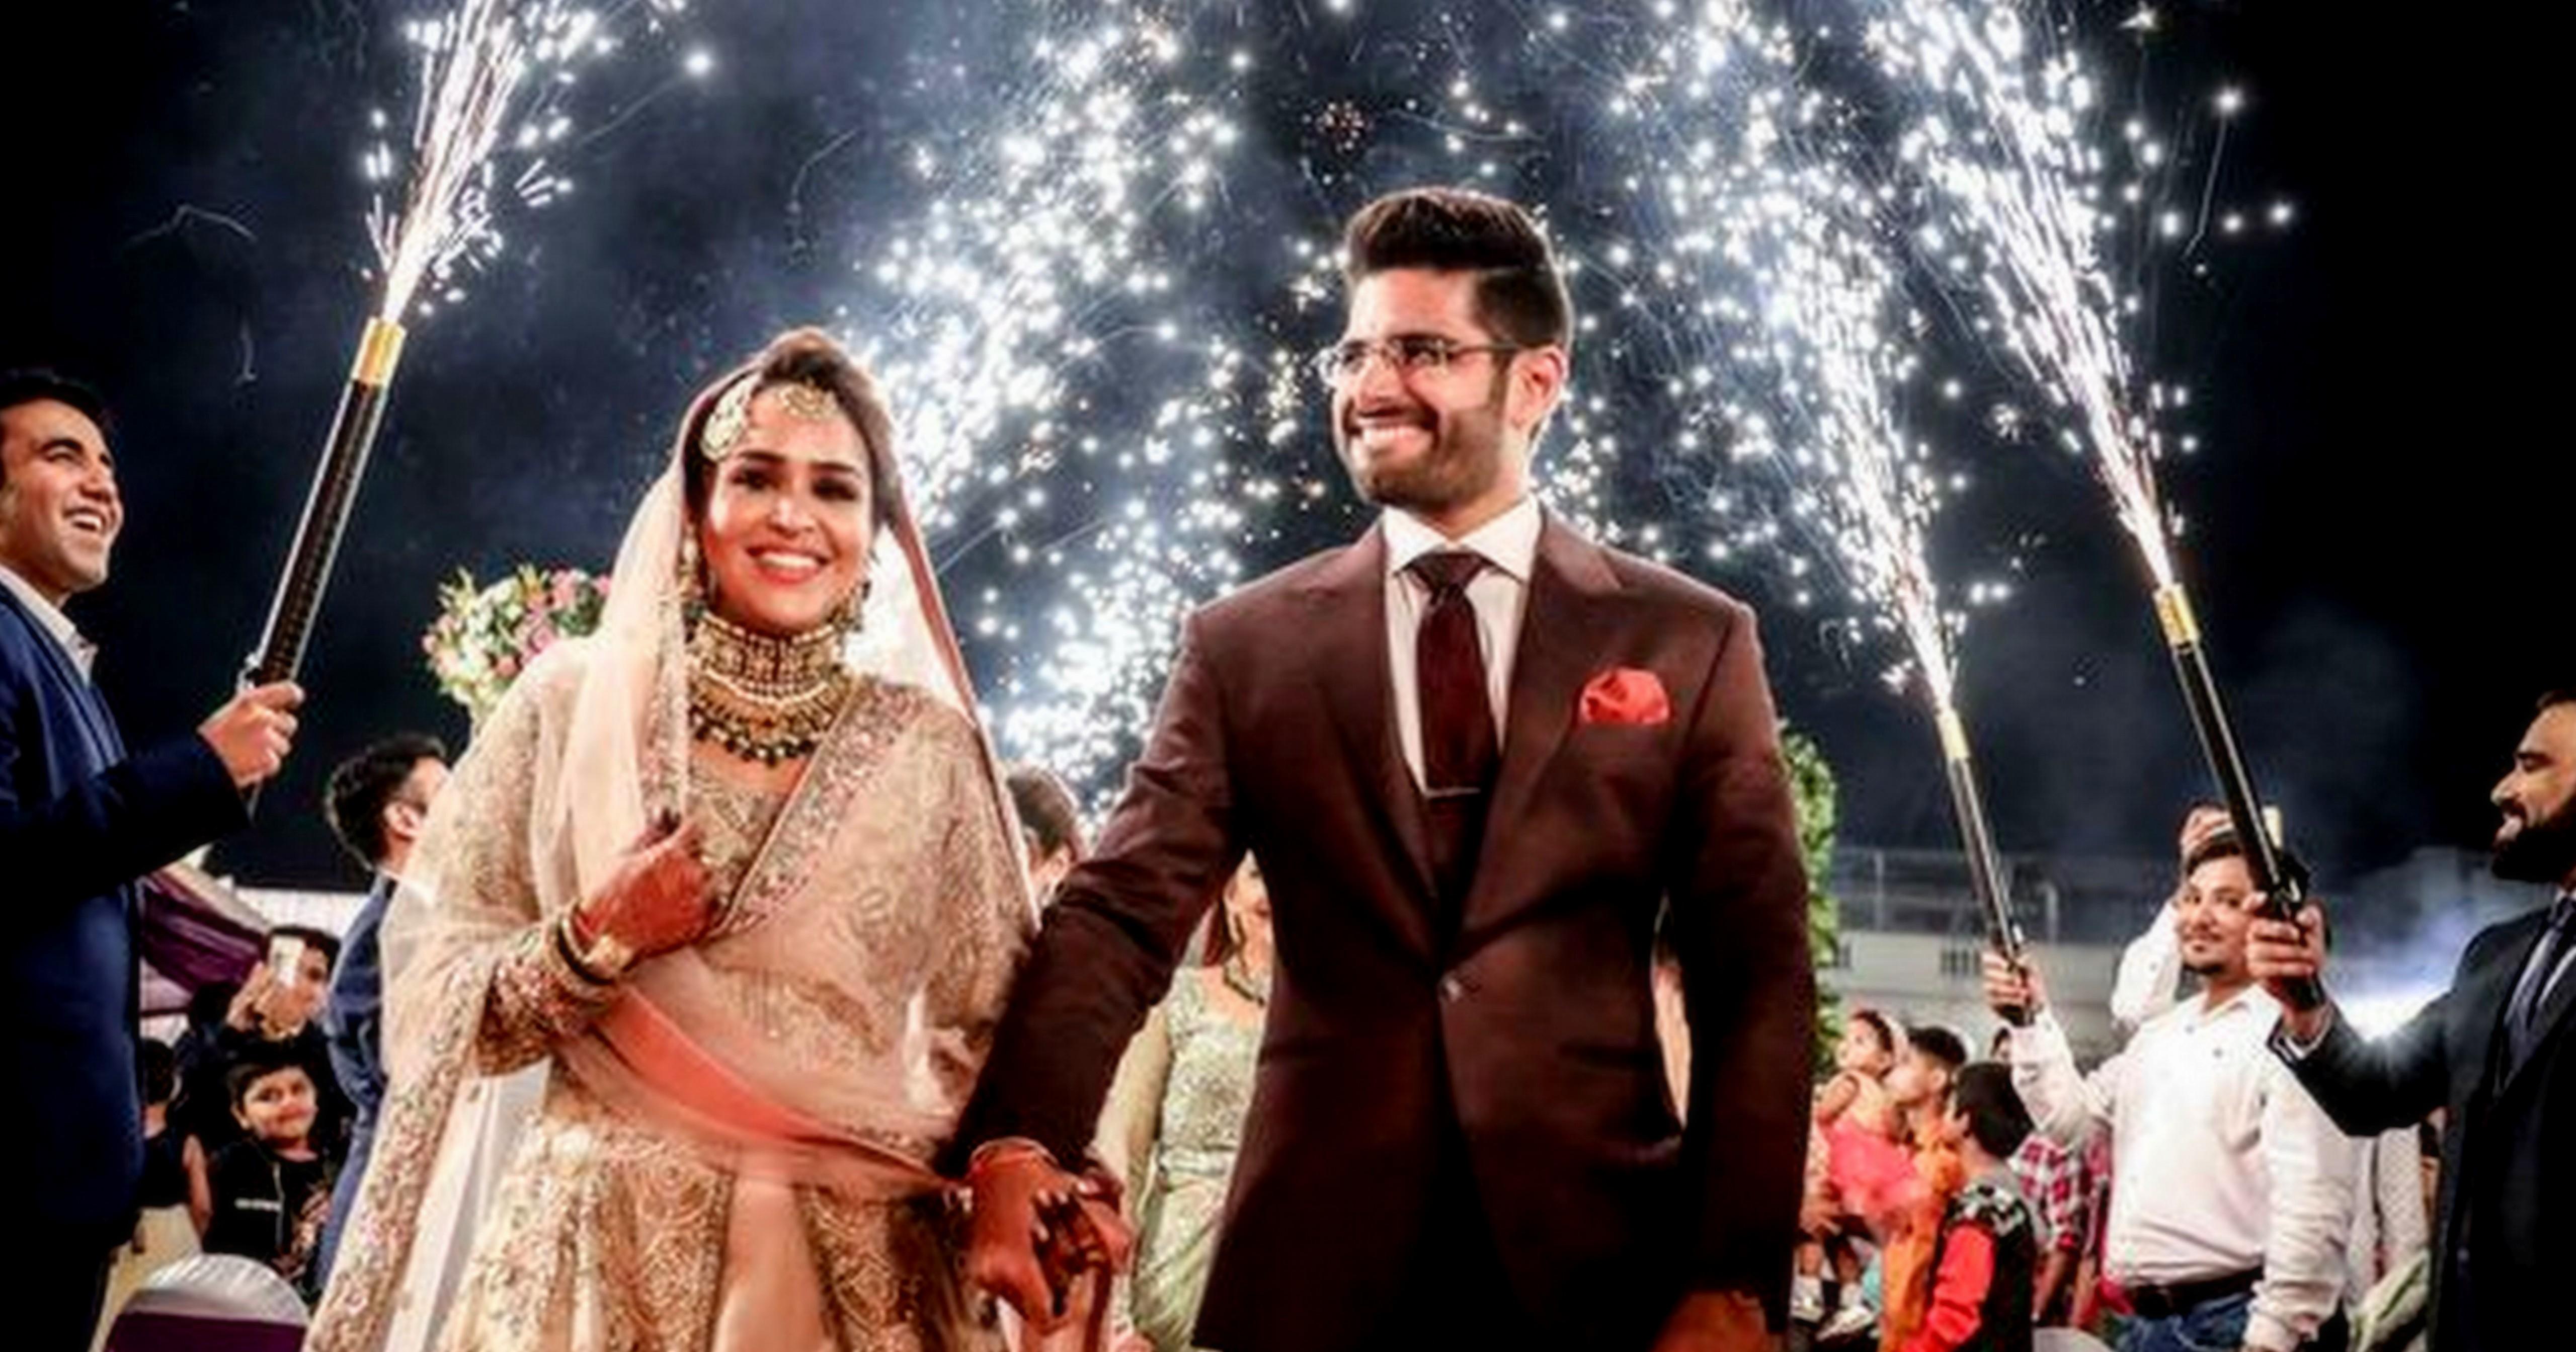 The best muslim weddings we have come across so far! - Blog